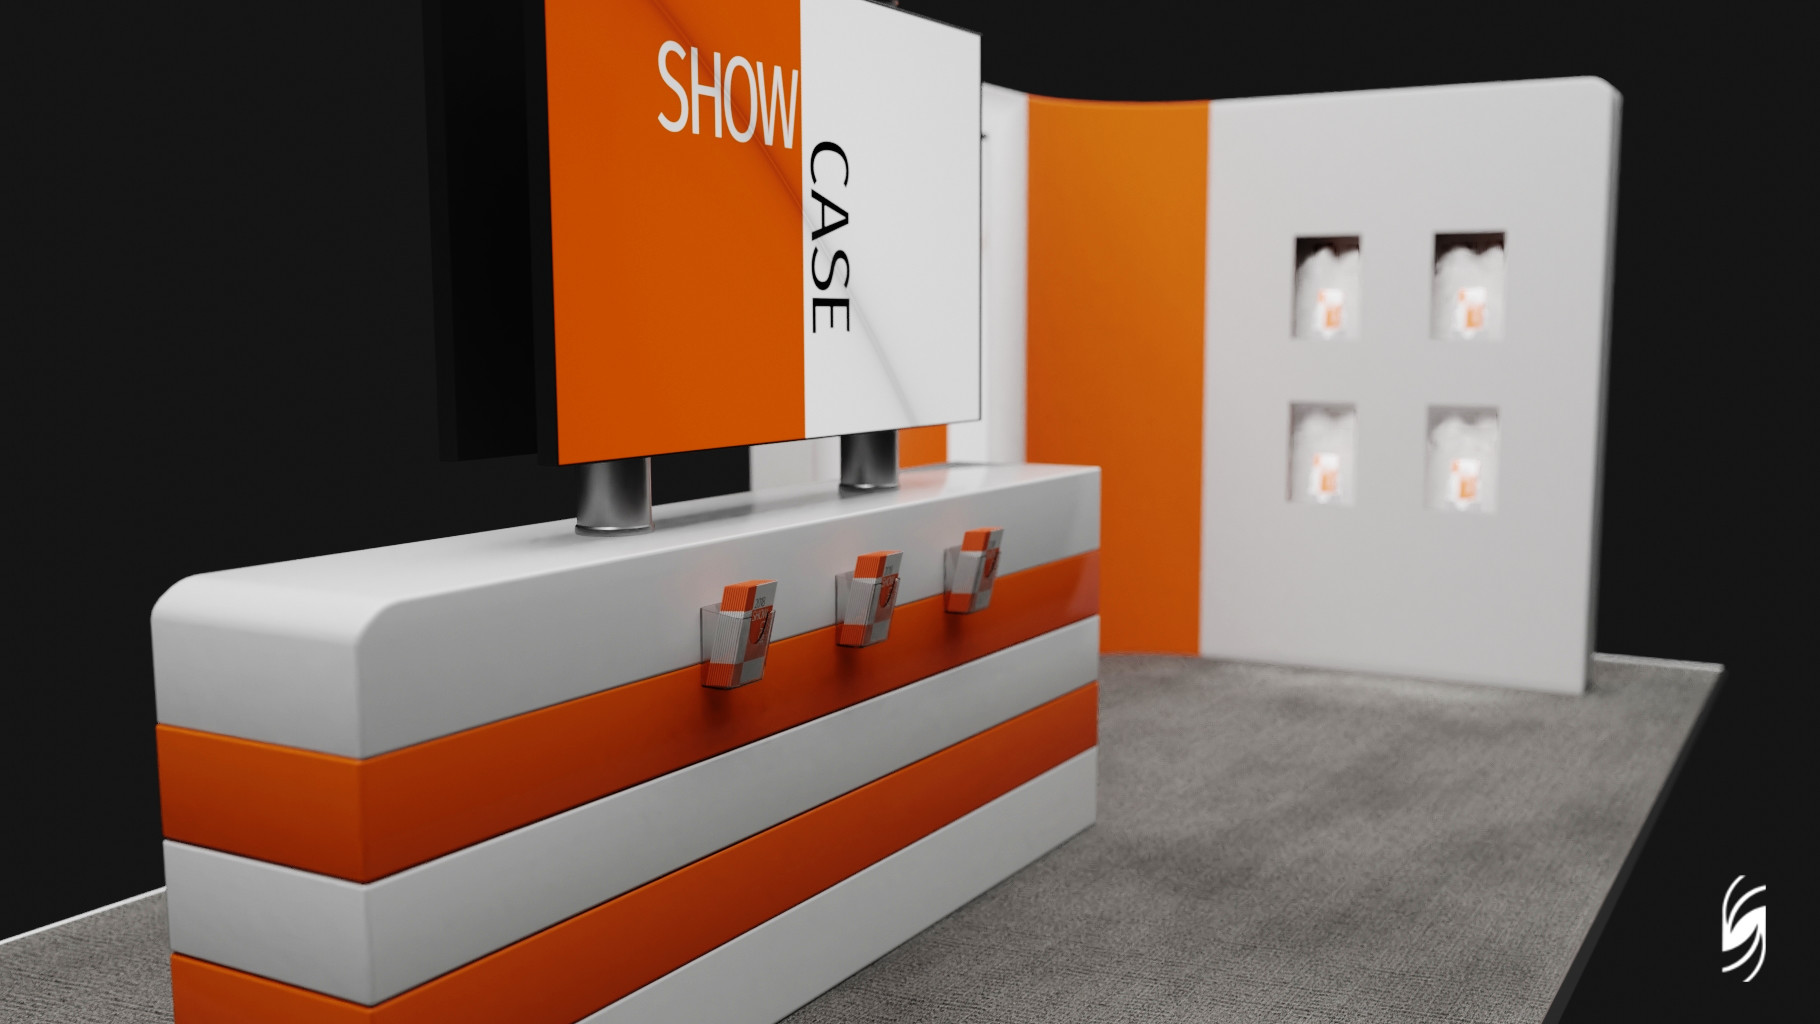 Exhibition Stand Design Price : Artstation exhibition stand concept stefan price